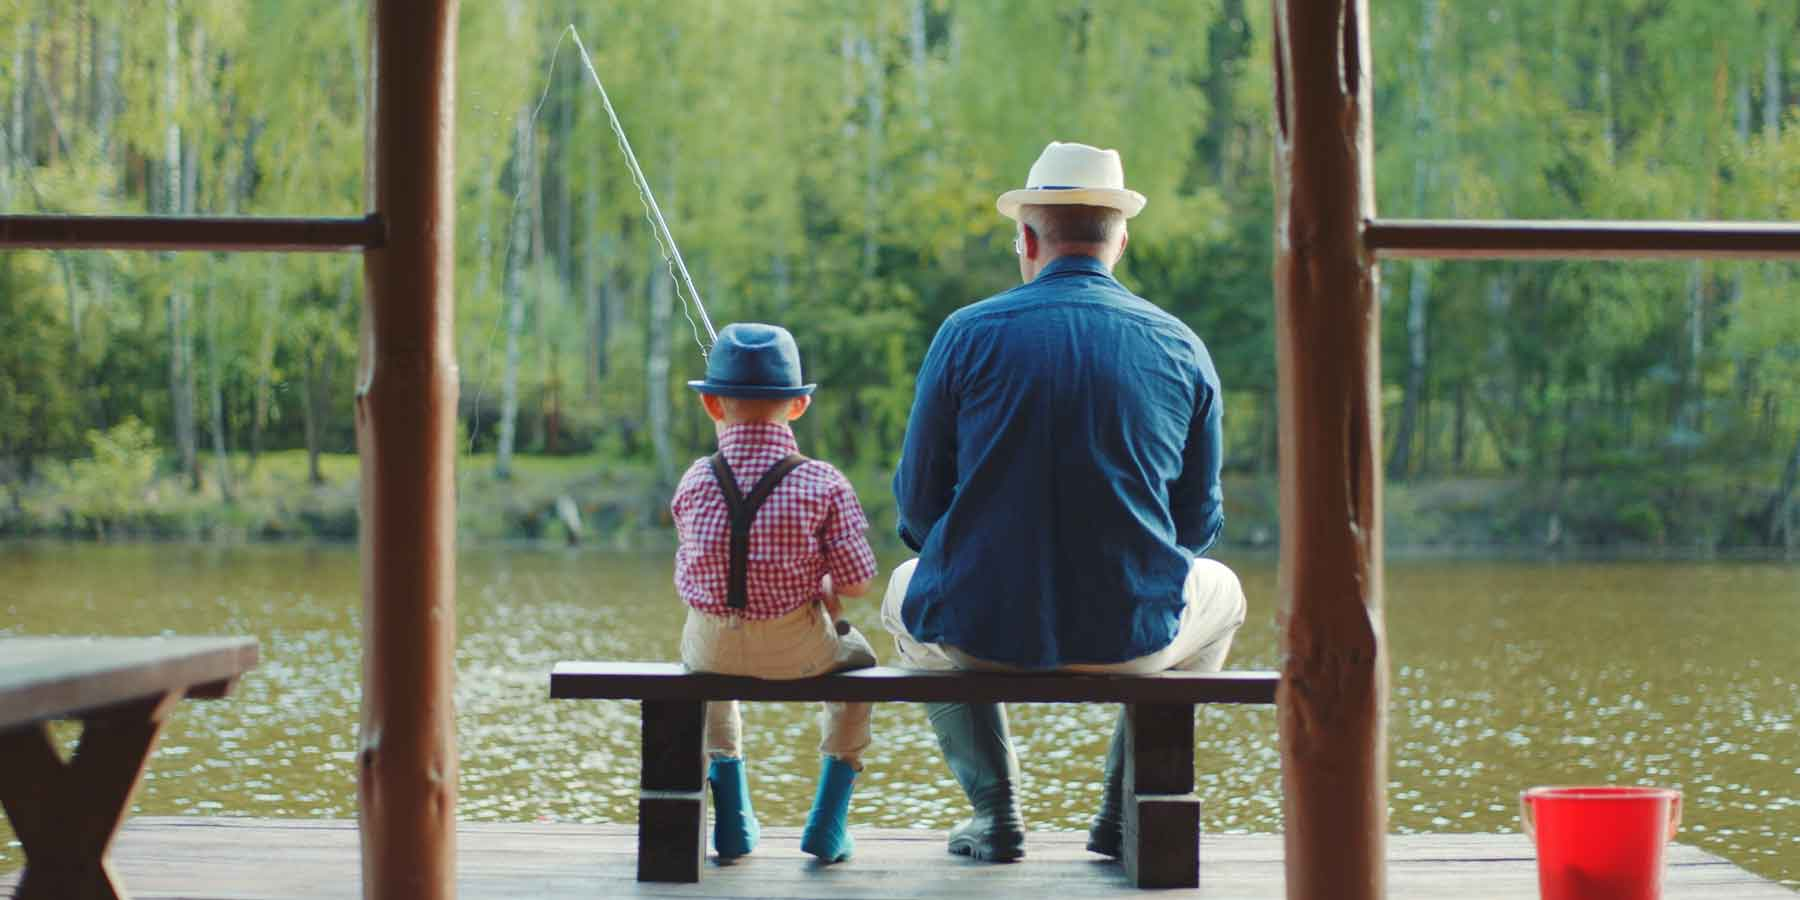 grandparent-grandchild bonding